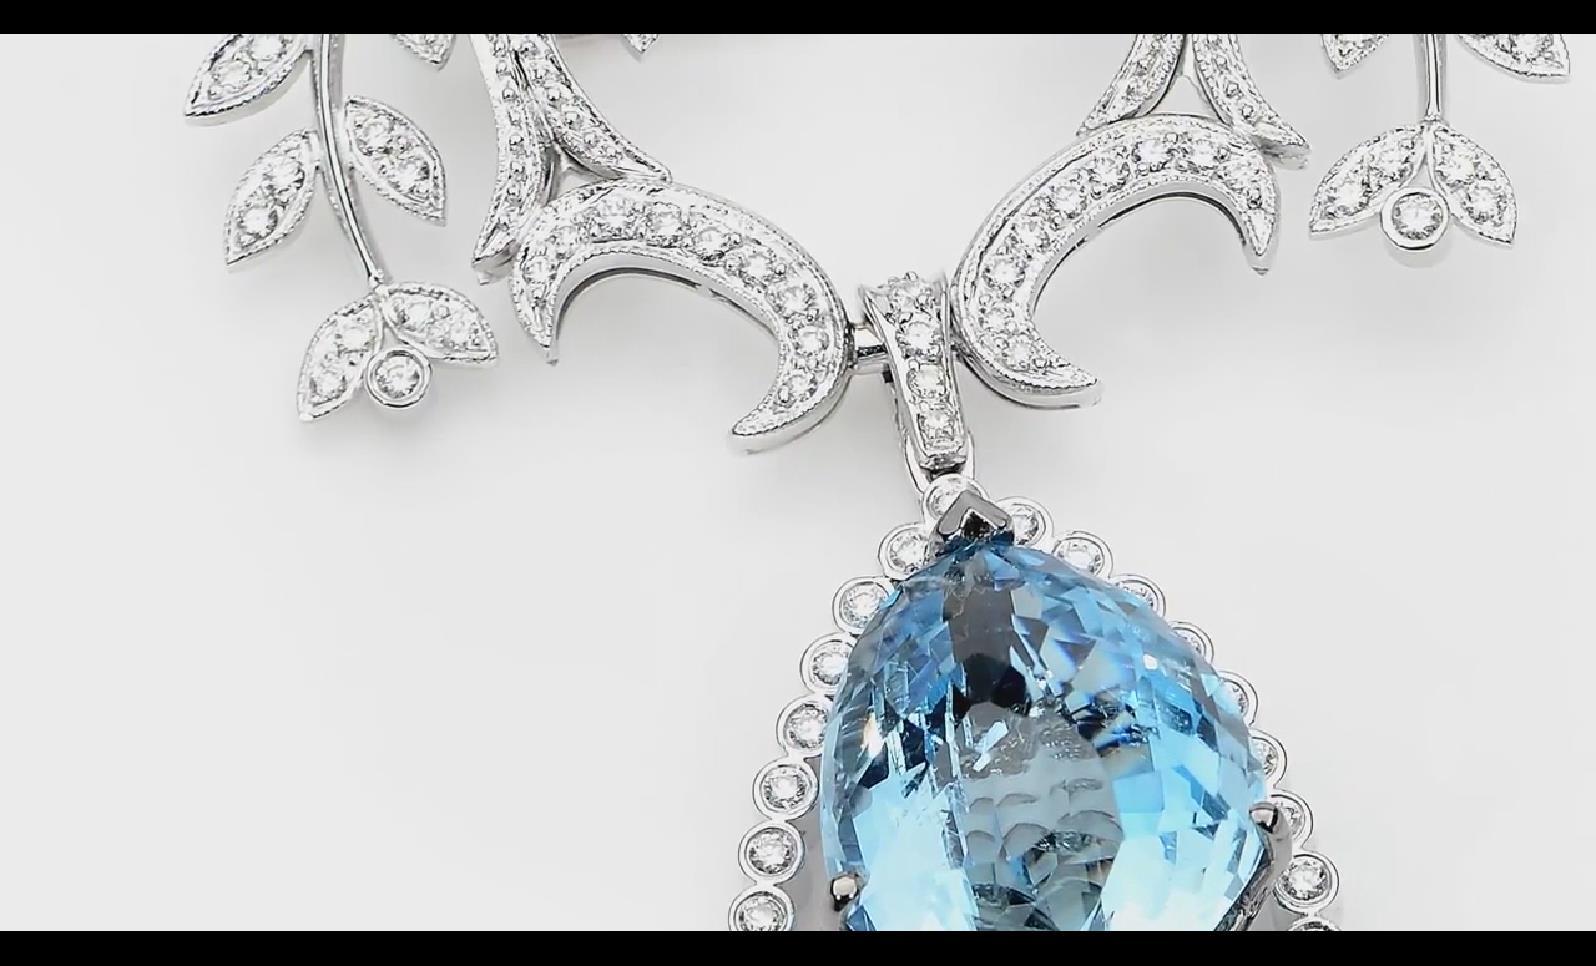 BS 046 BS 44 钻戒展示 珠宝工艺 珠宝设计 珠宝展示_10